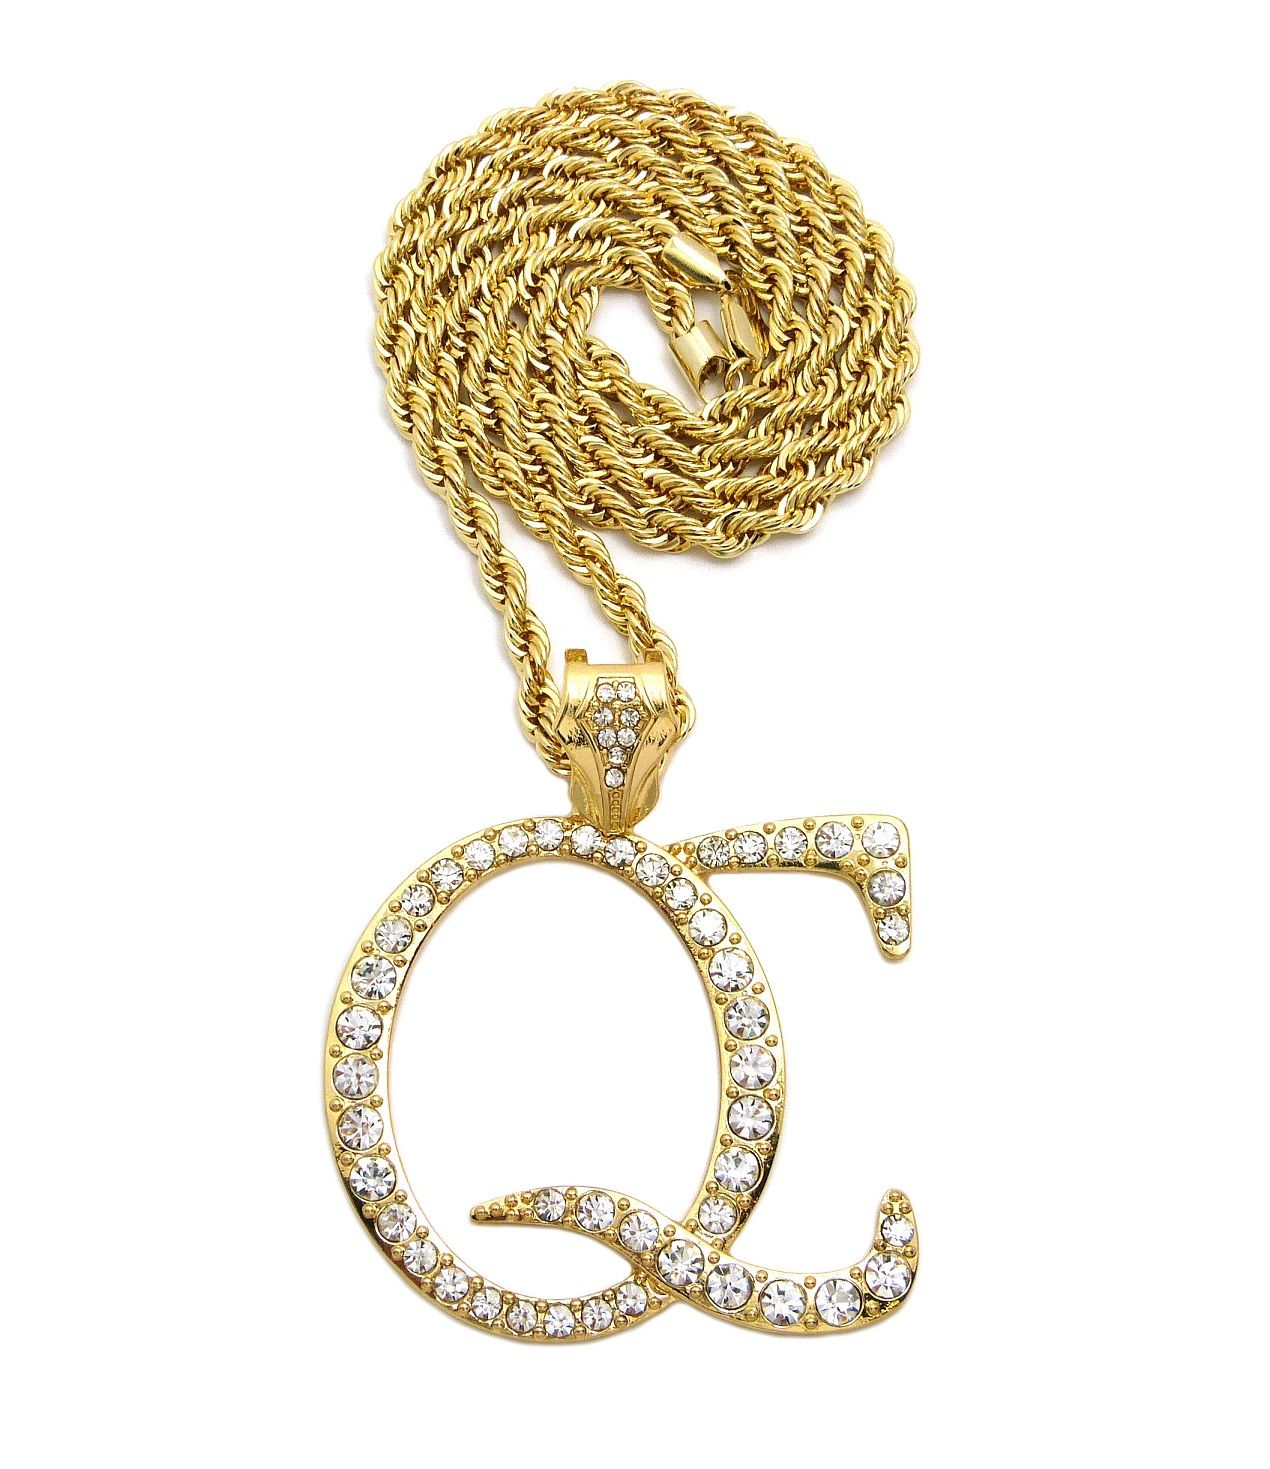 Iced Out Qc Pendant 24 Chains Hip Hop Necklaces Hops Necklace Pendant Necklace